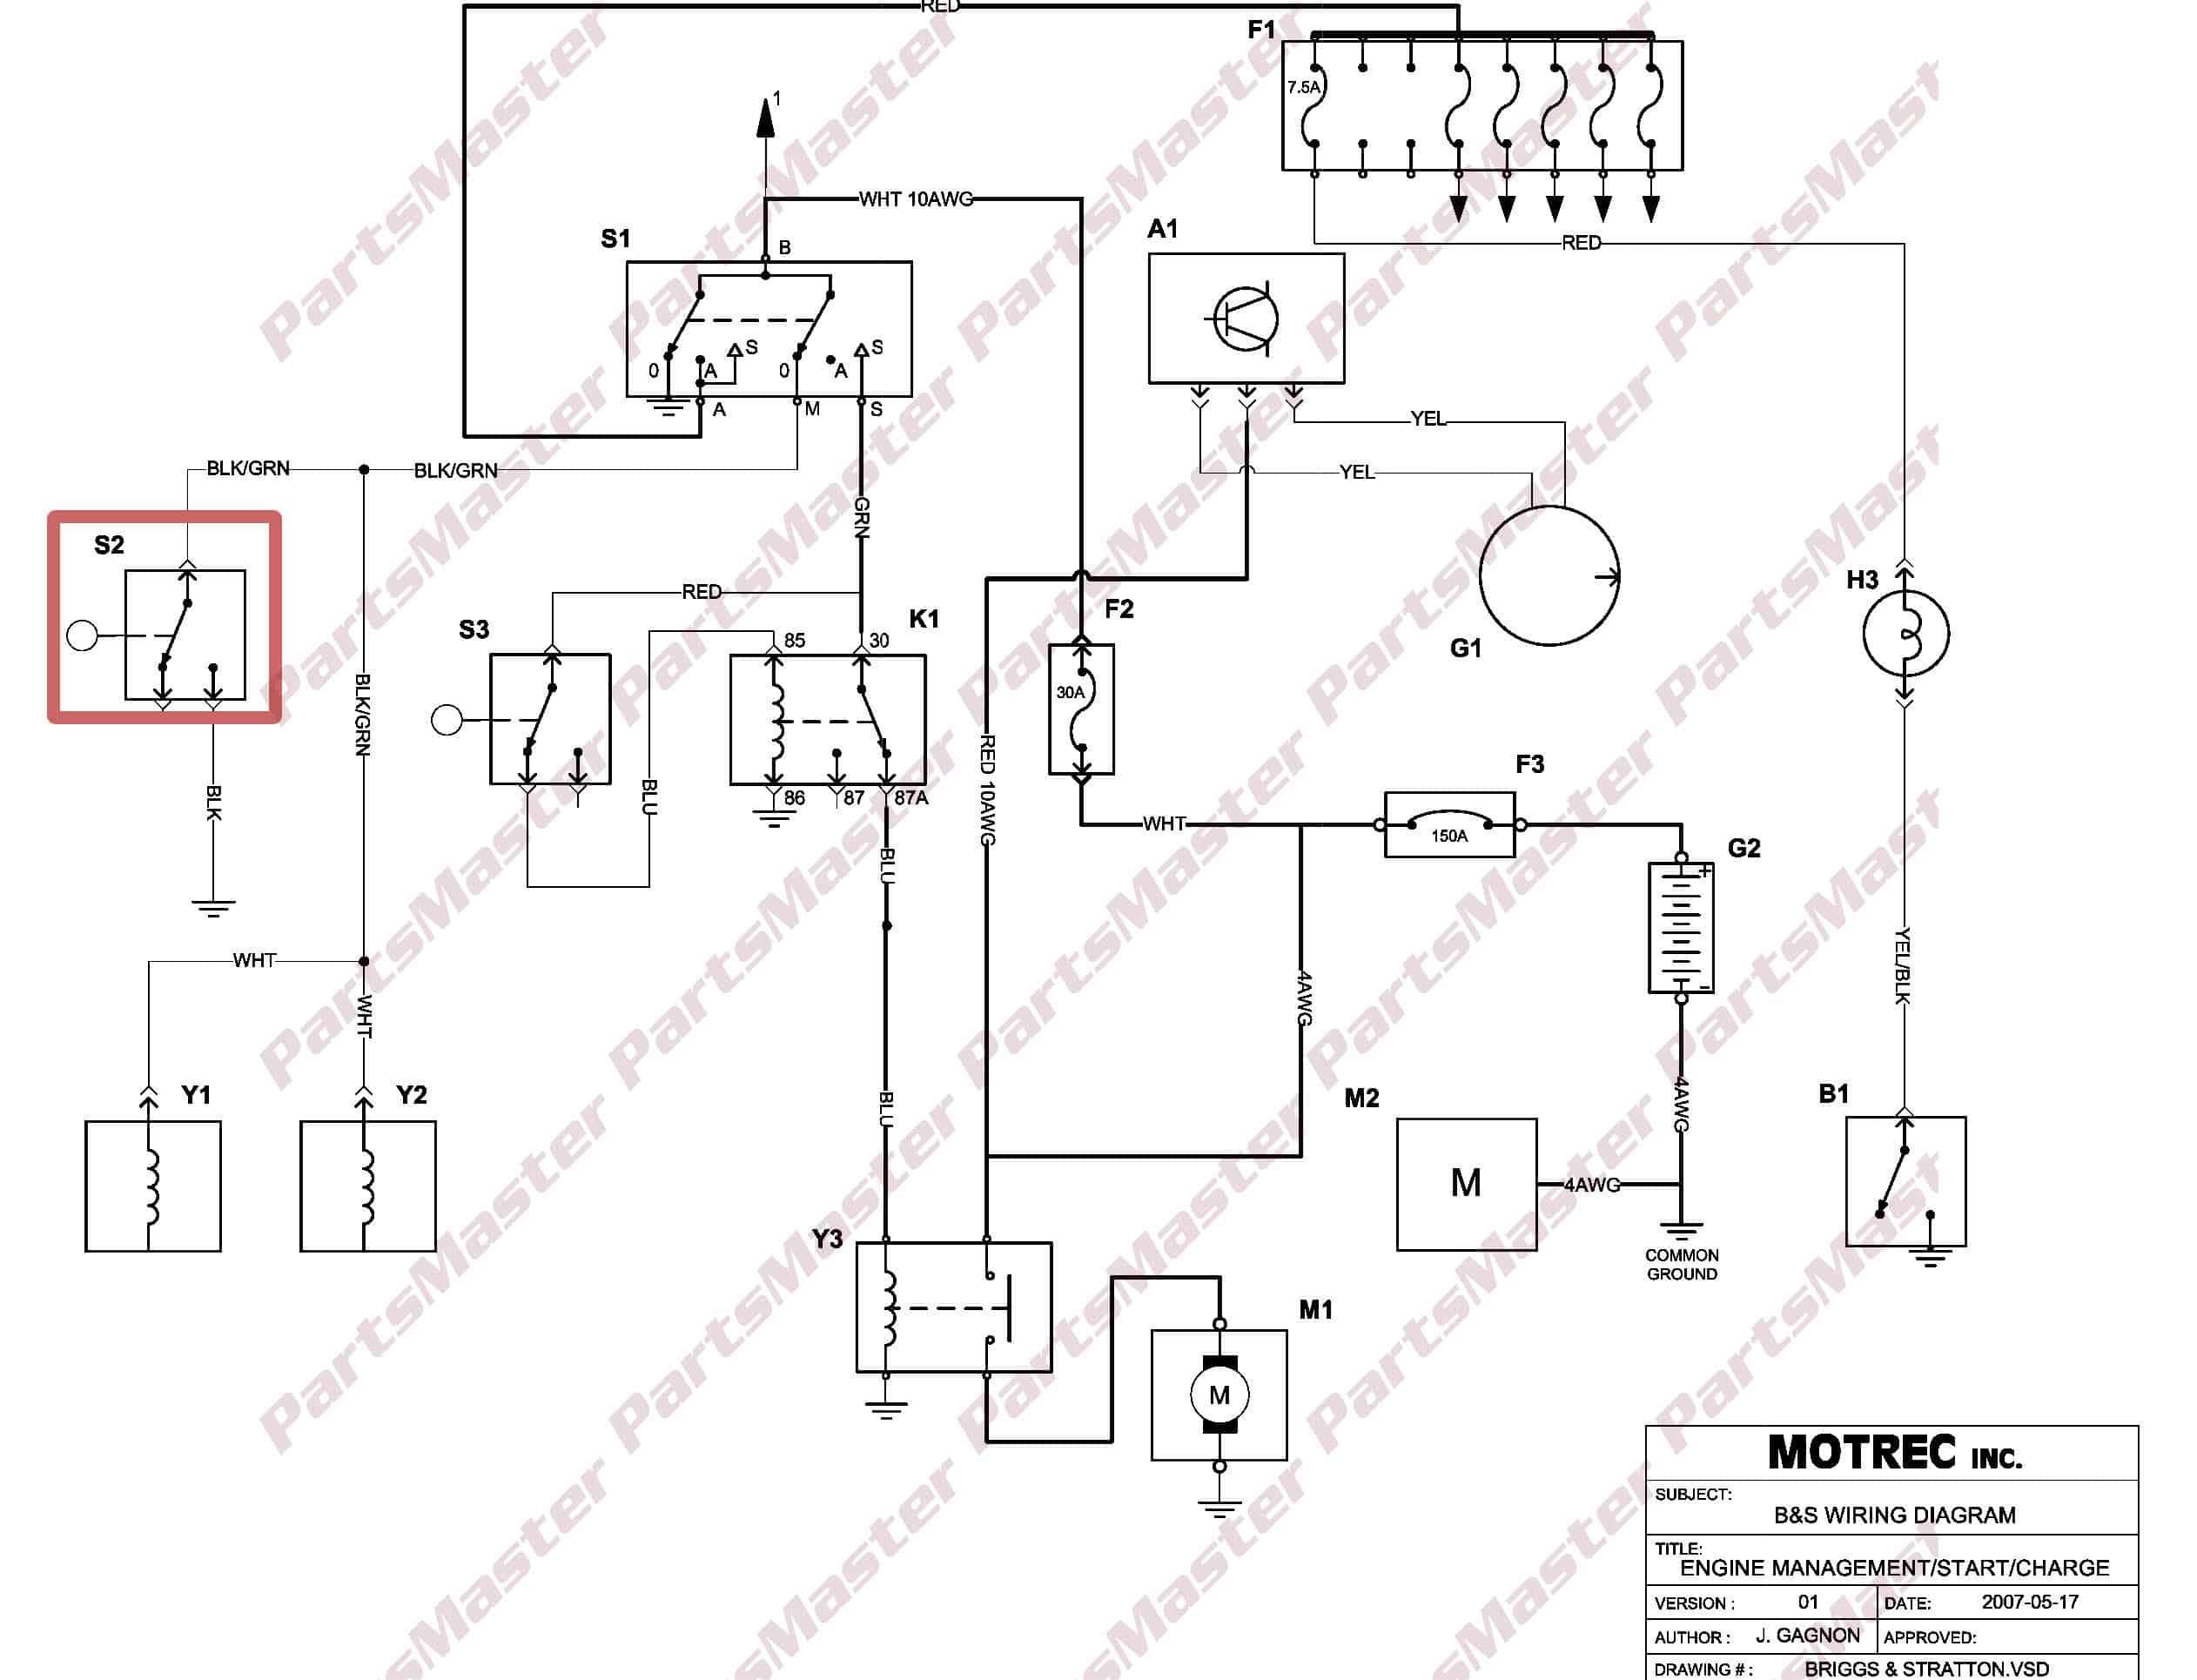 motrec wiring diagram wiring diagrams schematics rh alexanderblack co Cat 5 Wiring Color Diagrams 2001 Arctic Cat 250 Wiring Diagram